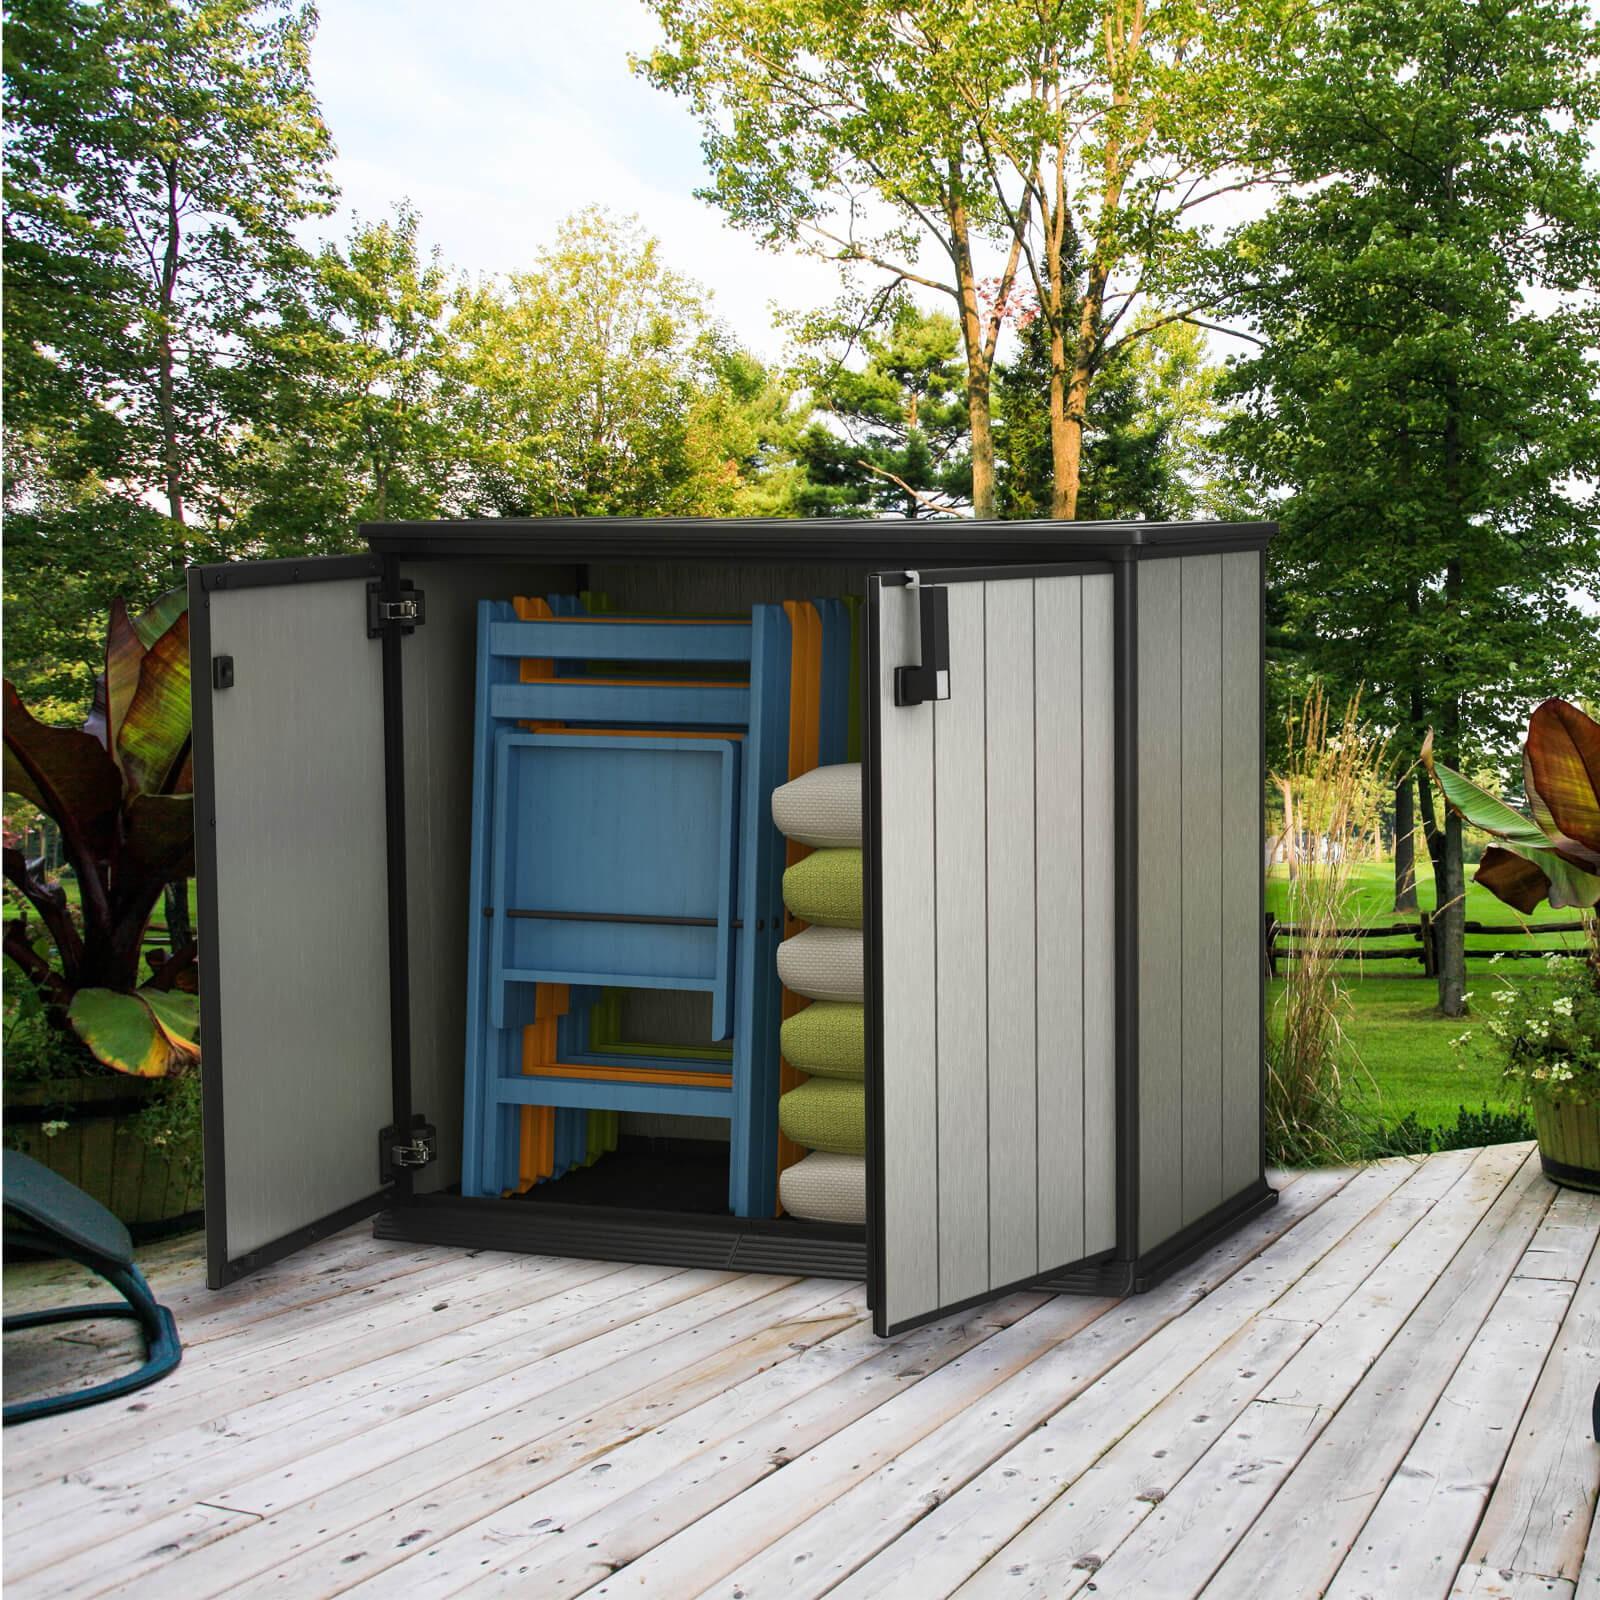 keter gartenschrank ger teschrank patio store 1000 liter. Black Bedroom Furniture Sets. Home Design Ideas